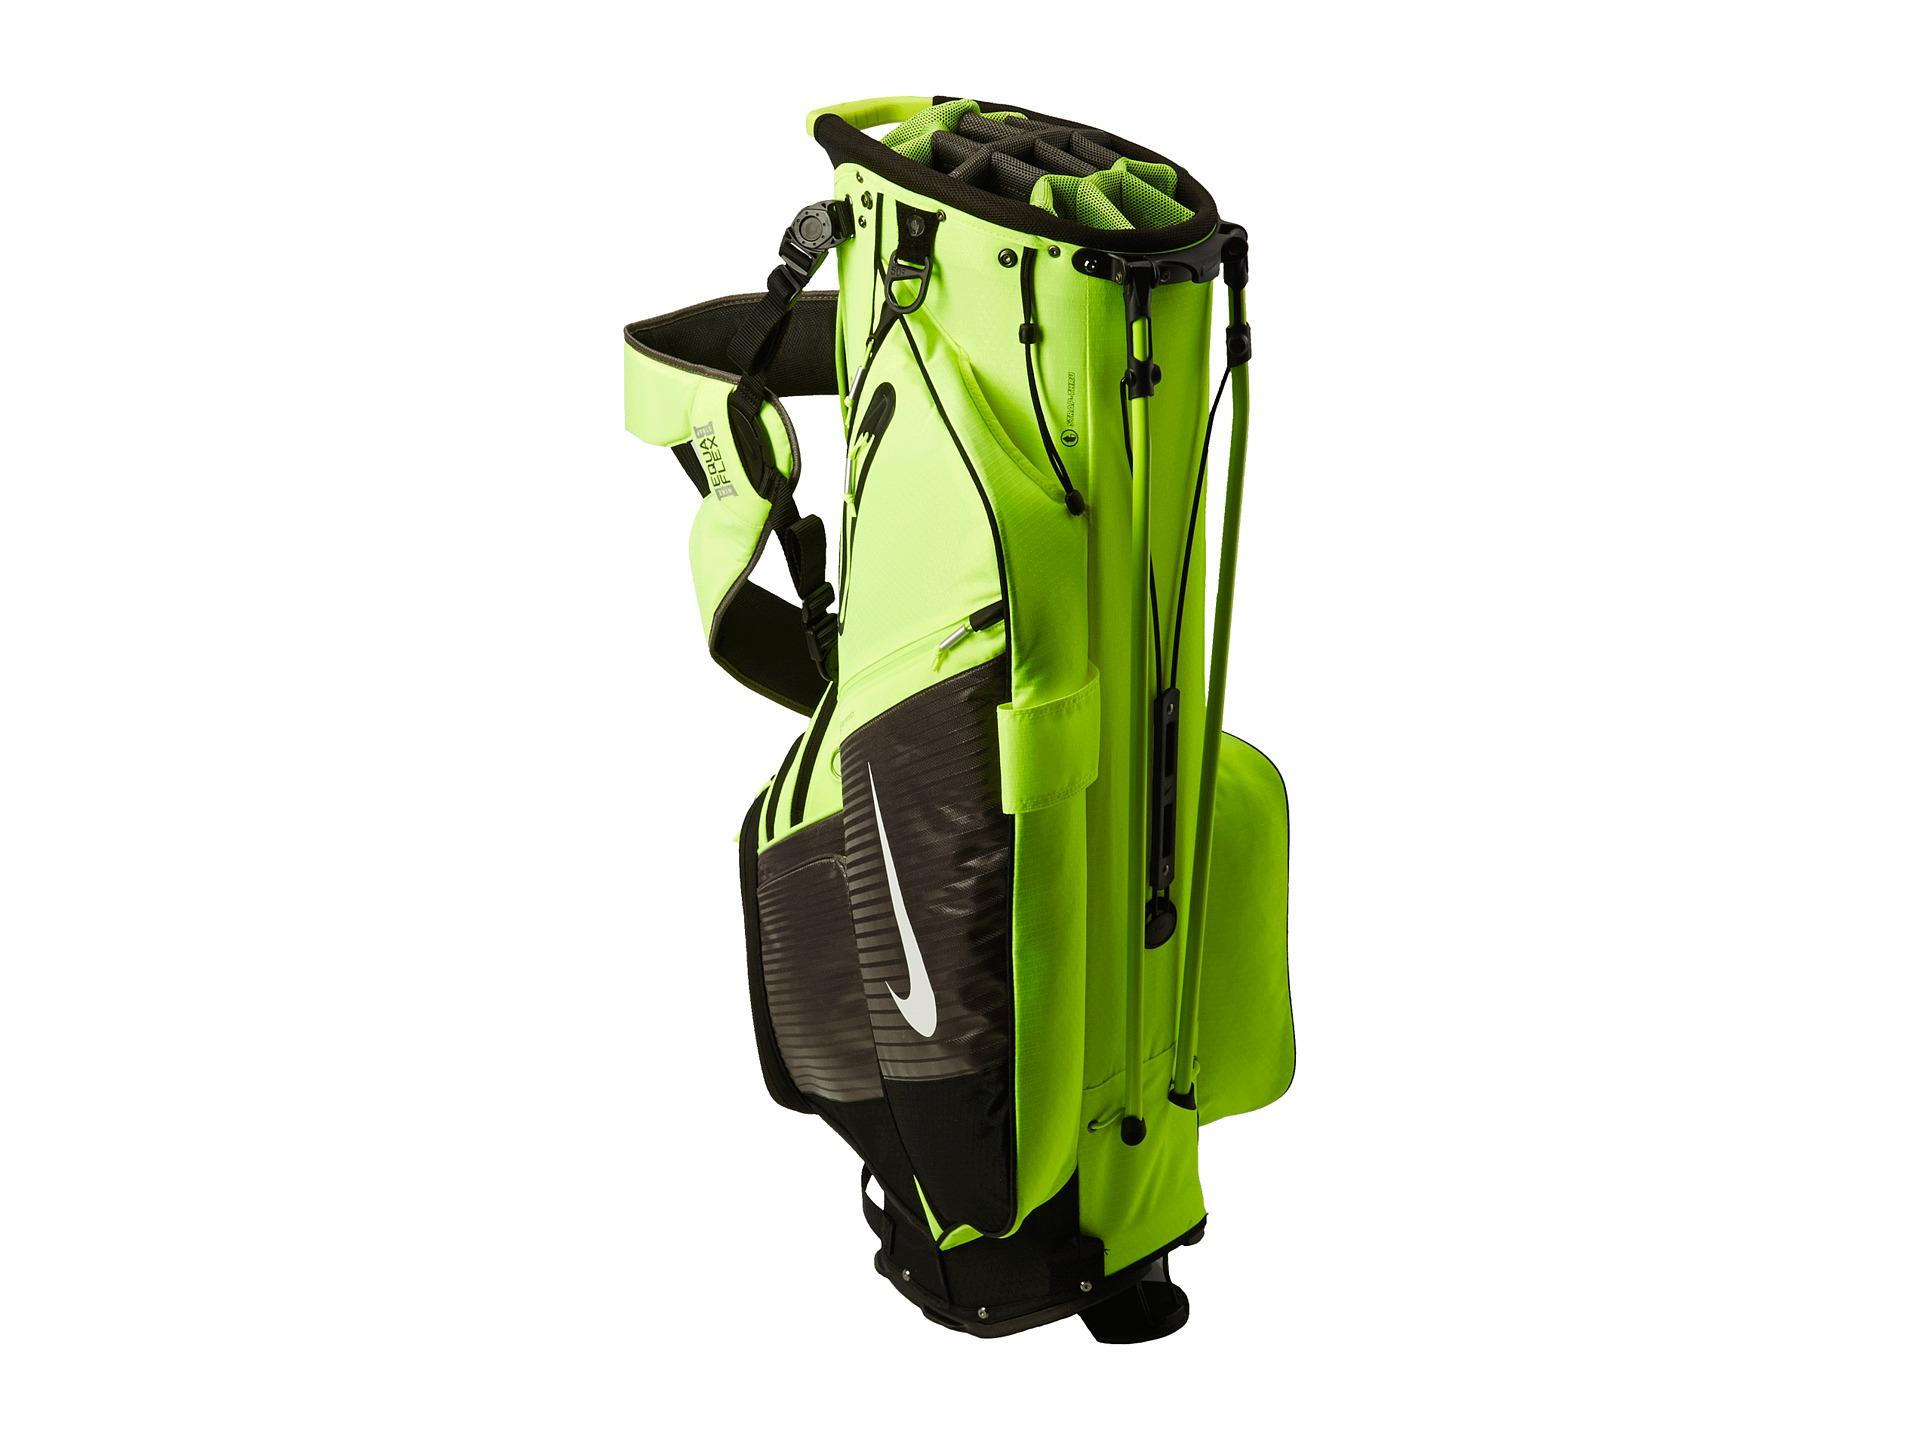 Nike Golf Air Hybrid Carry Bag on PopScreen 077f549bfb6